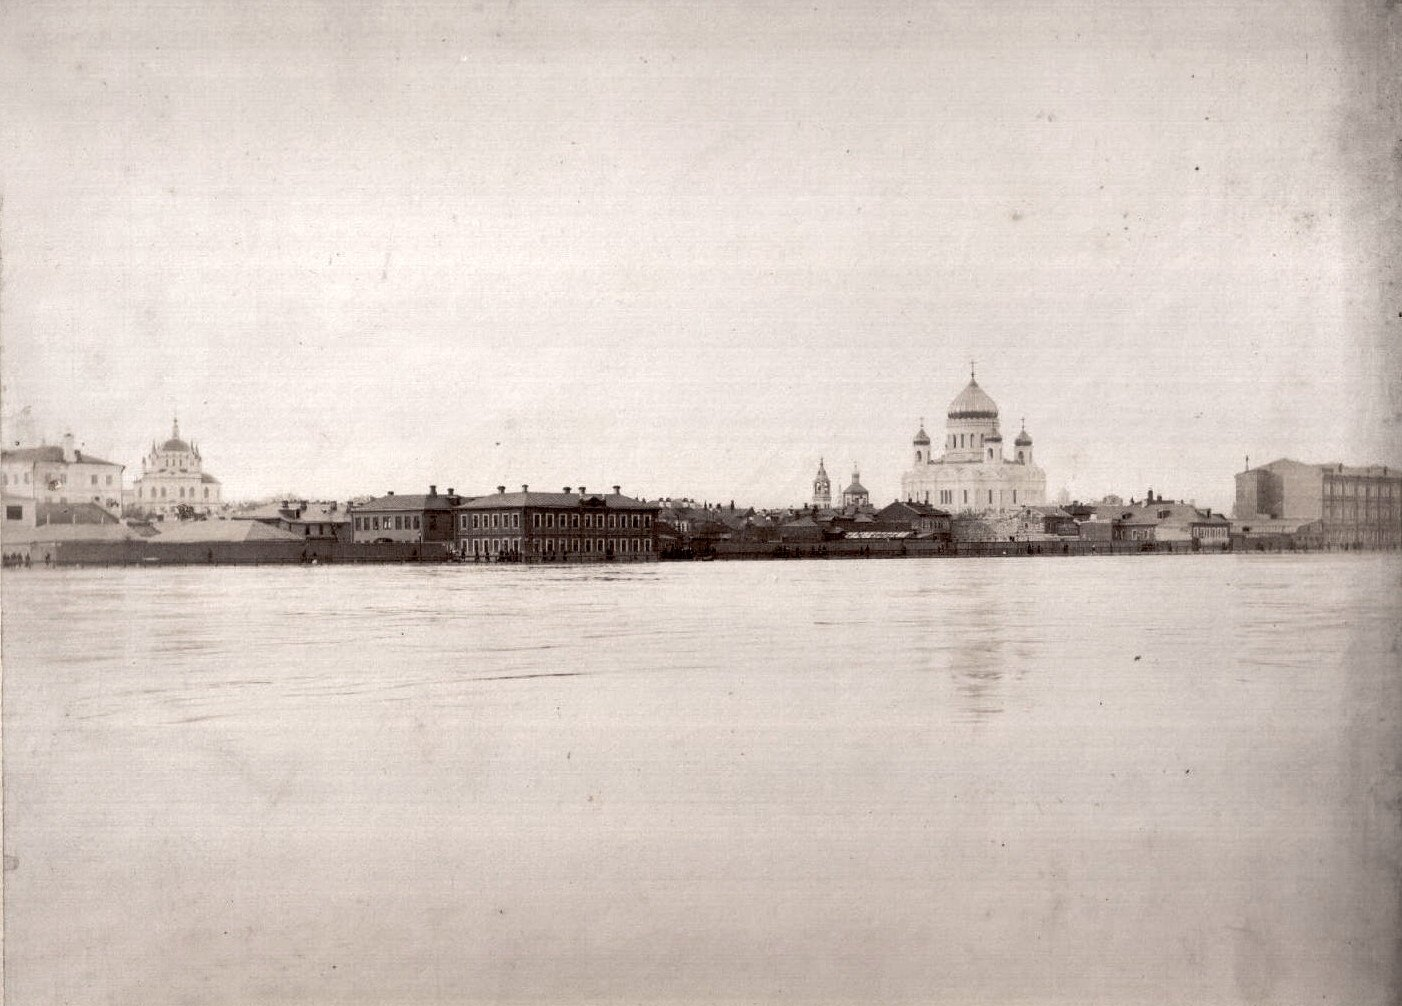 Наводнение 15-17 апреля 1895 года в Москве. Вид на храм Христа Спасителя